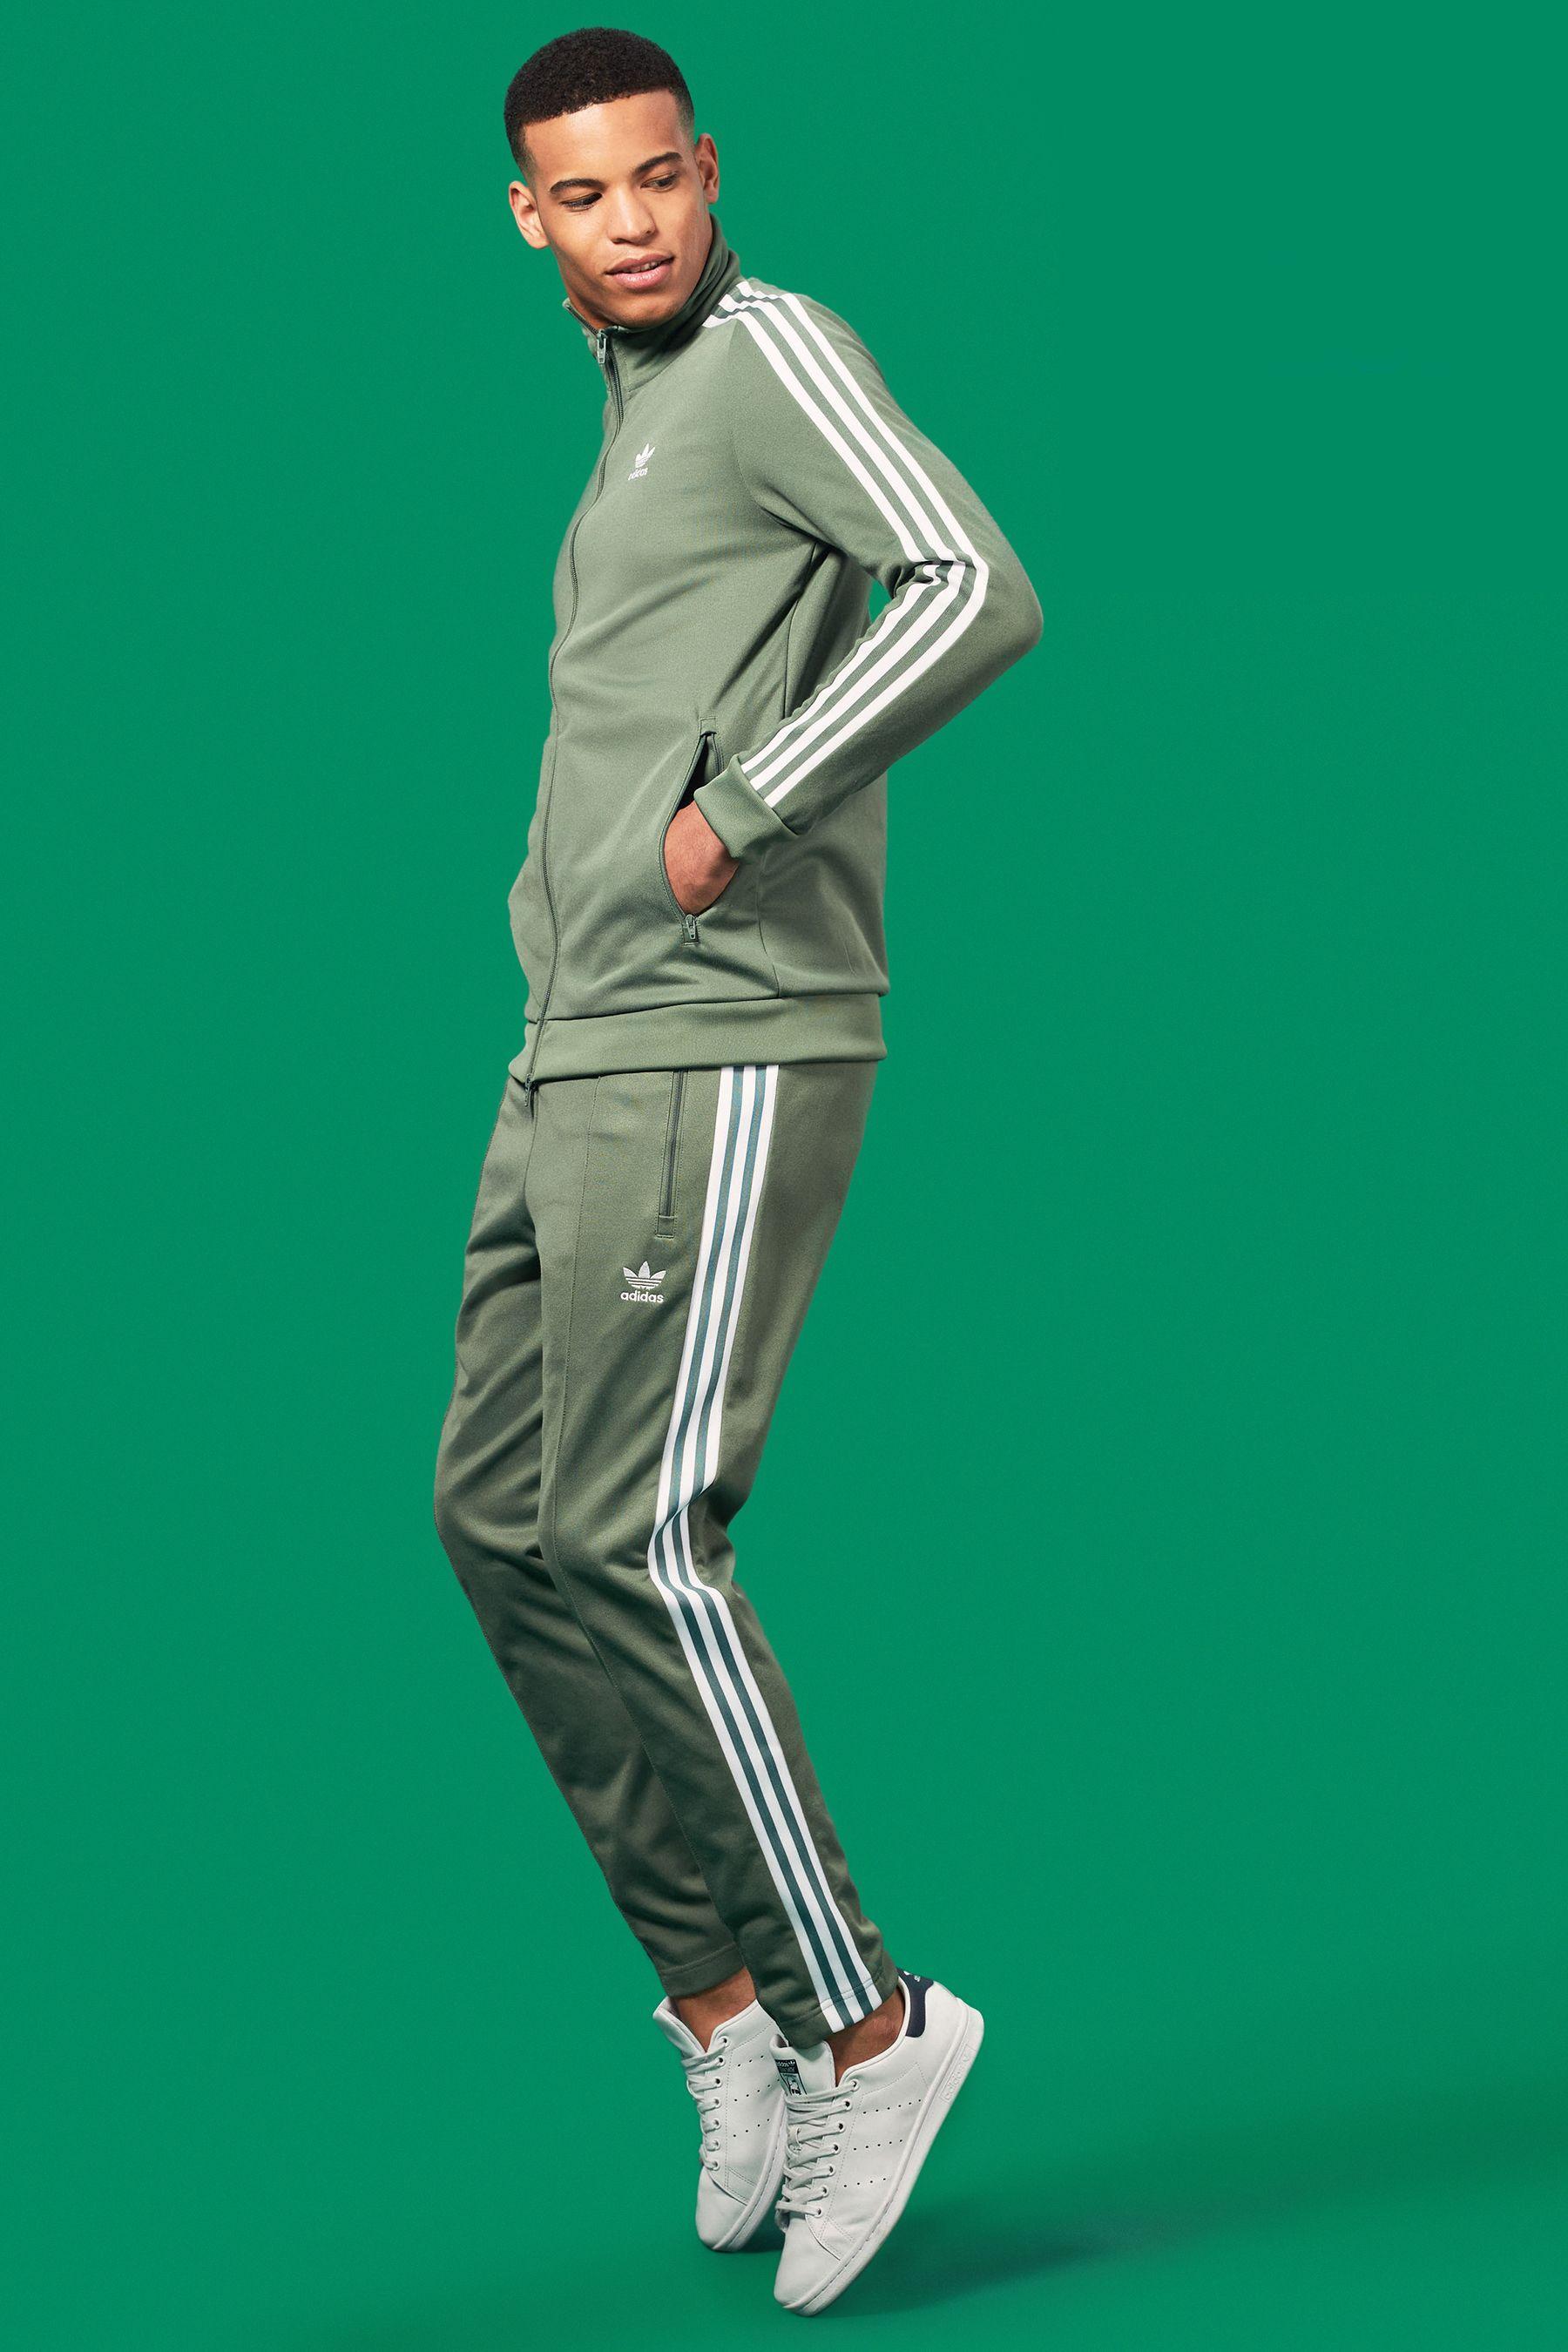 adidas beckenbauer verdi